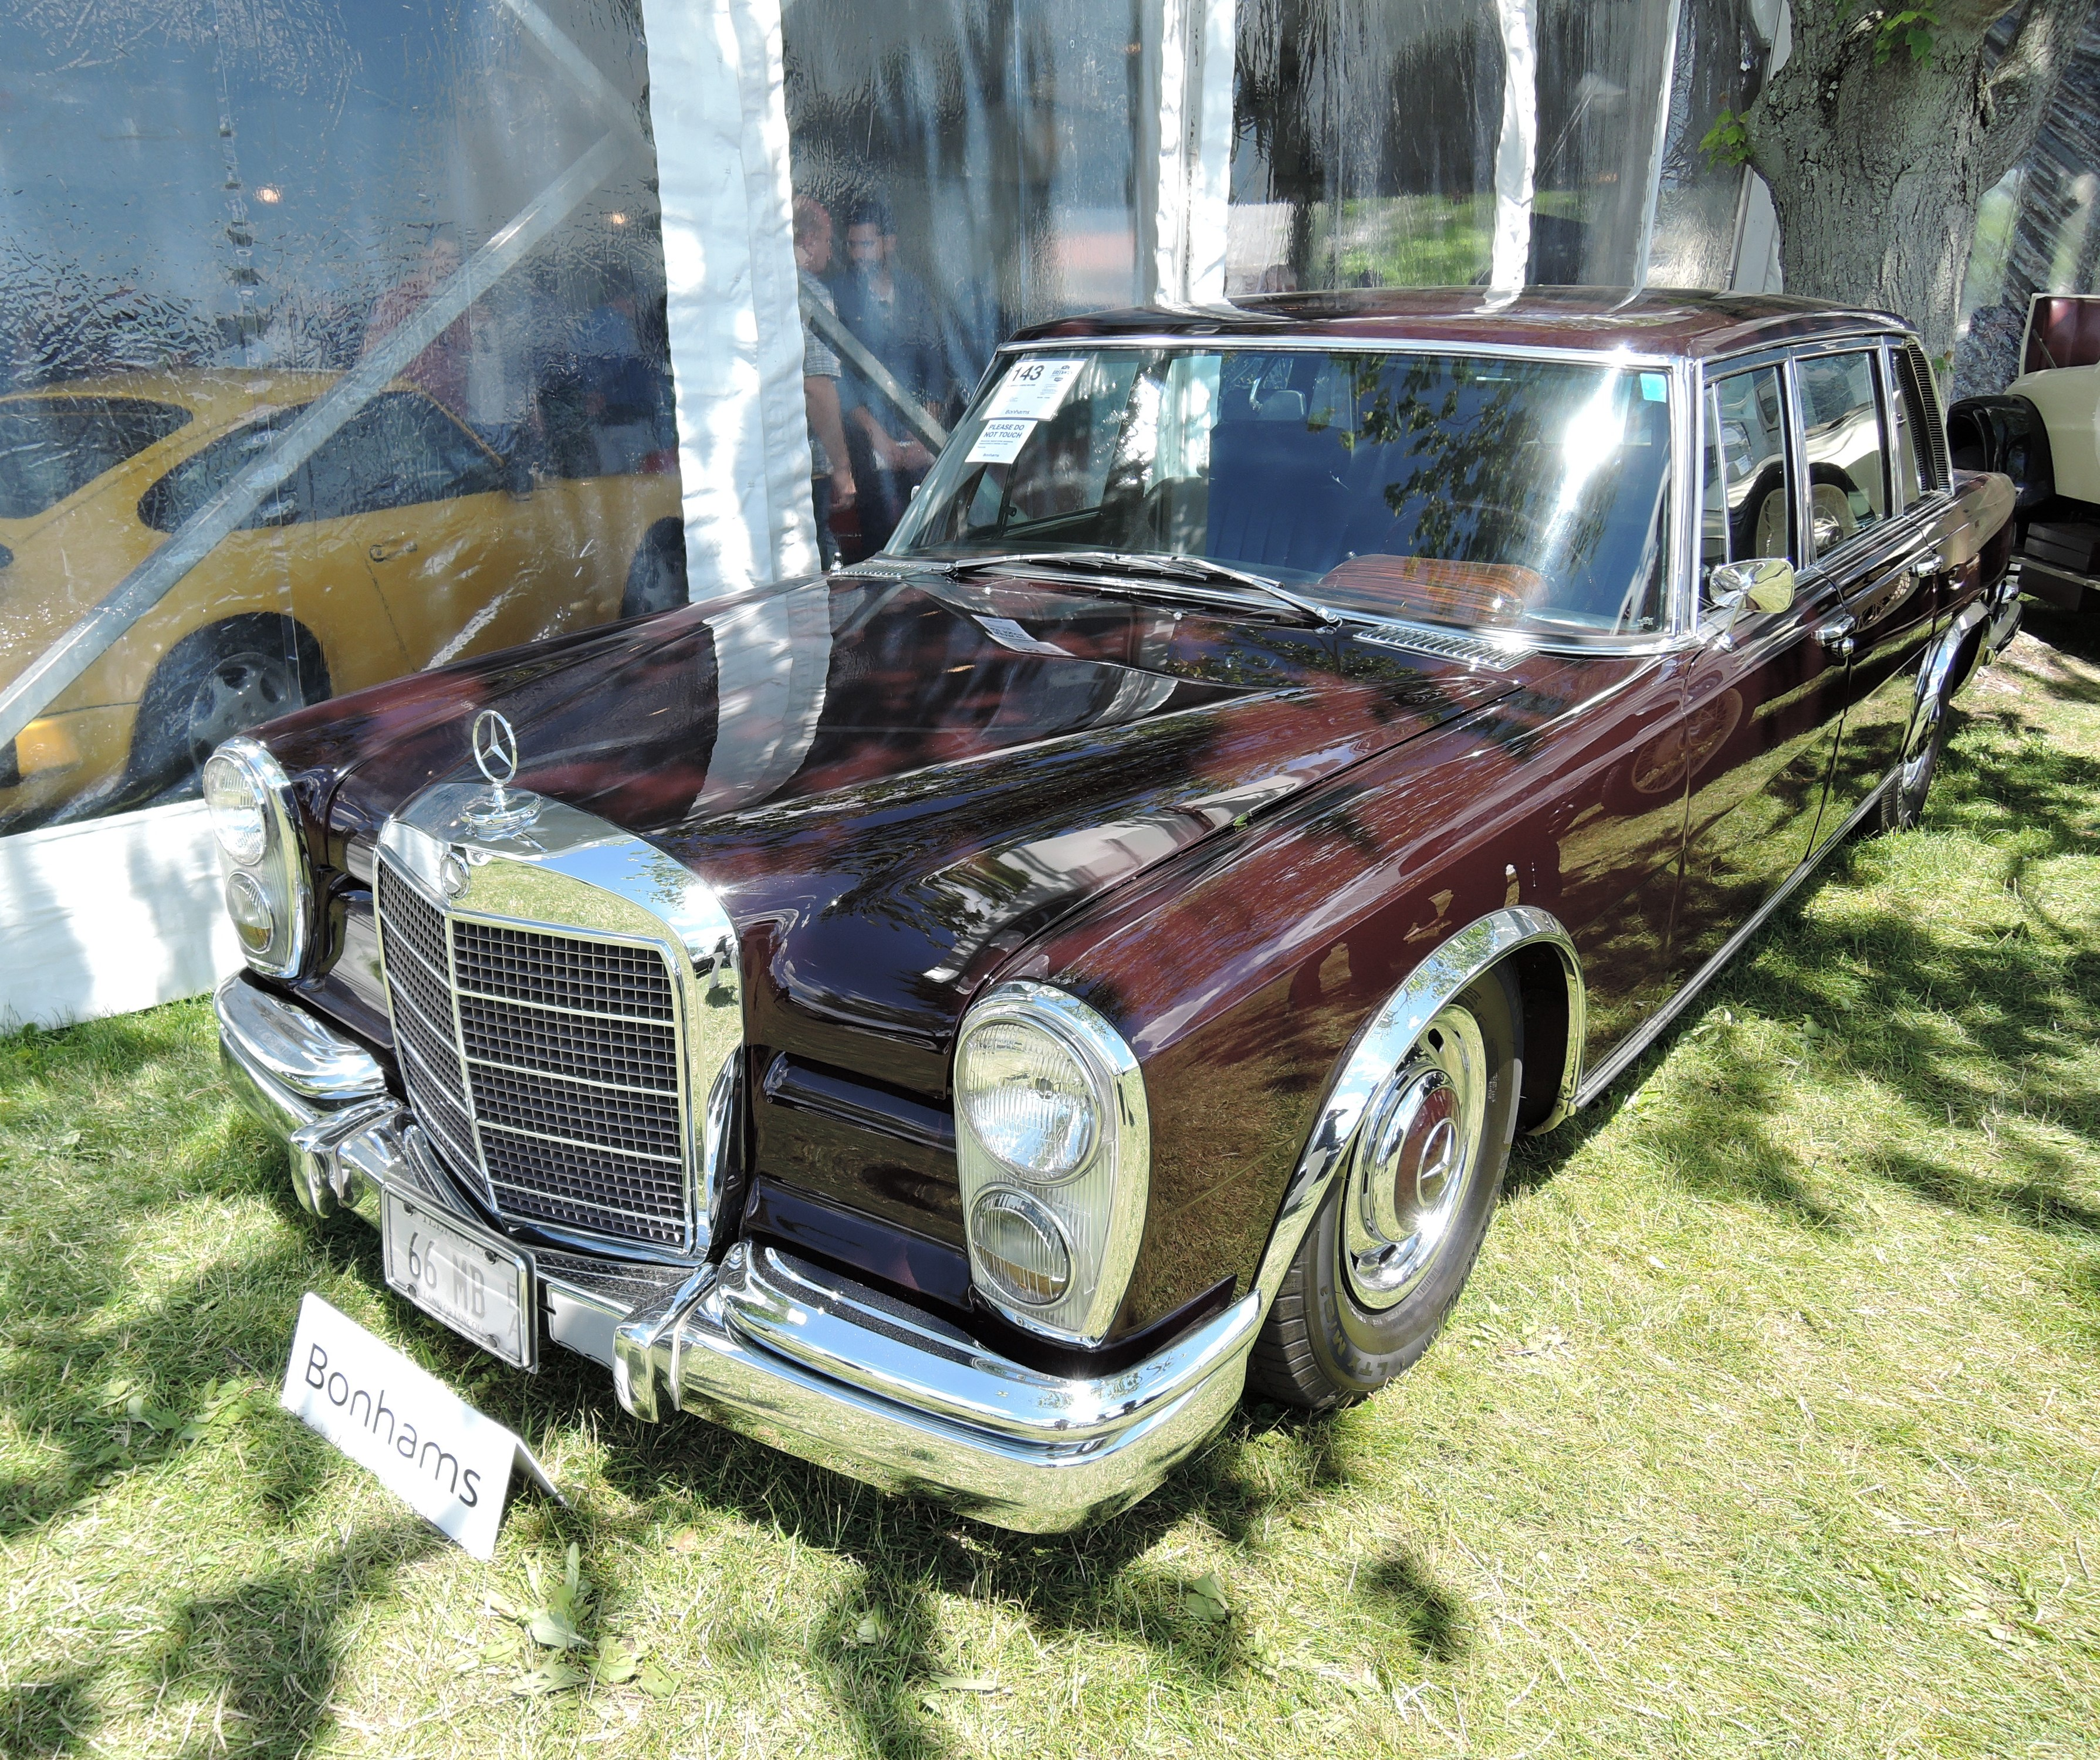 bonhams dark red 1966 Mercedes-Benz 600 SWB - Greenwich Concours d'Elegance 2017